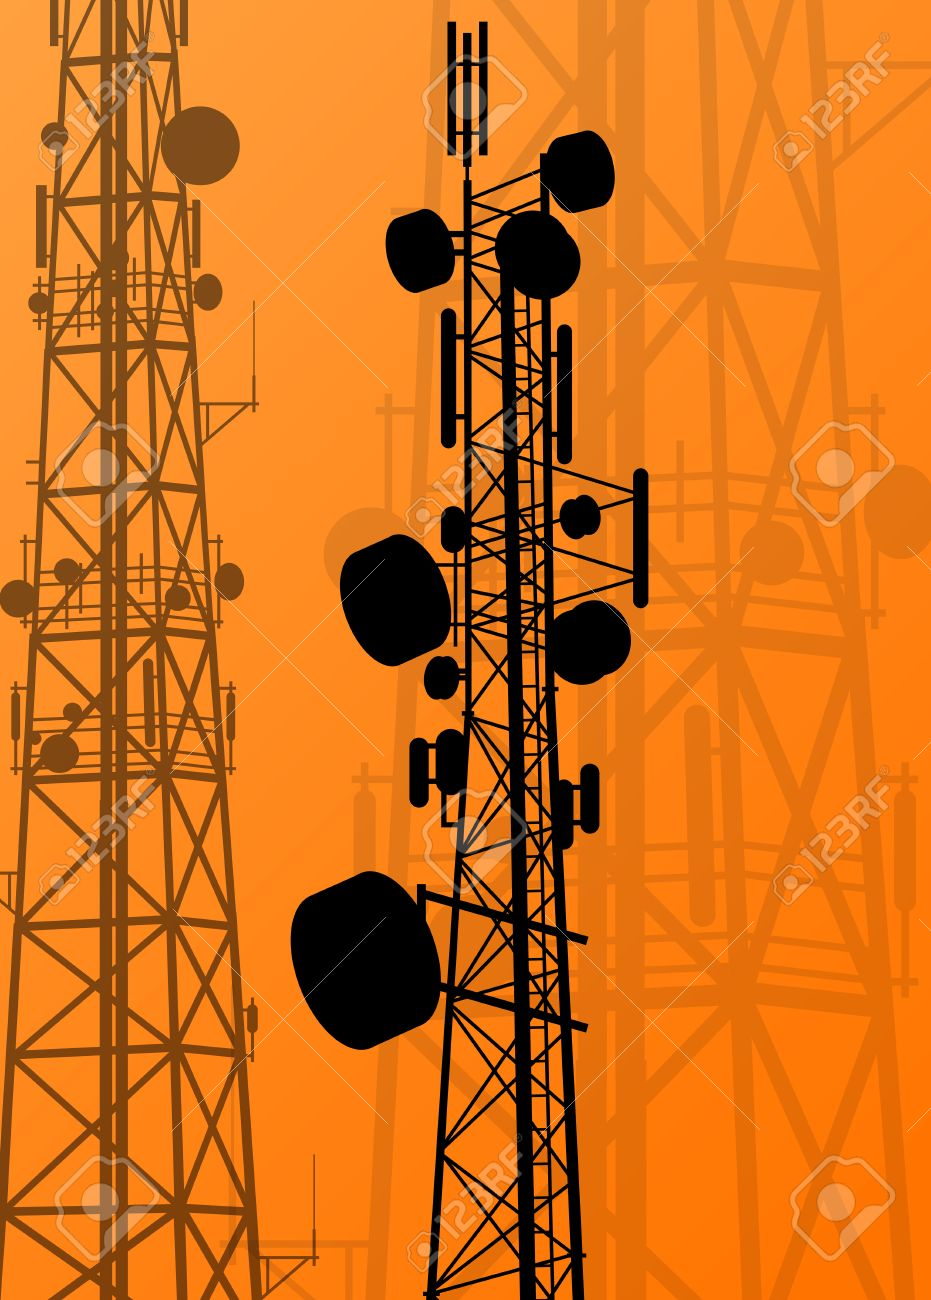 Communication transmission tower radio signal phone antenna vector - 56778569